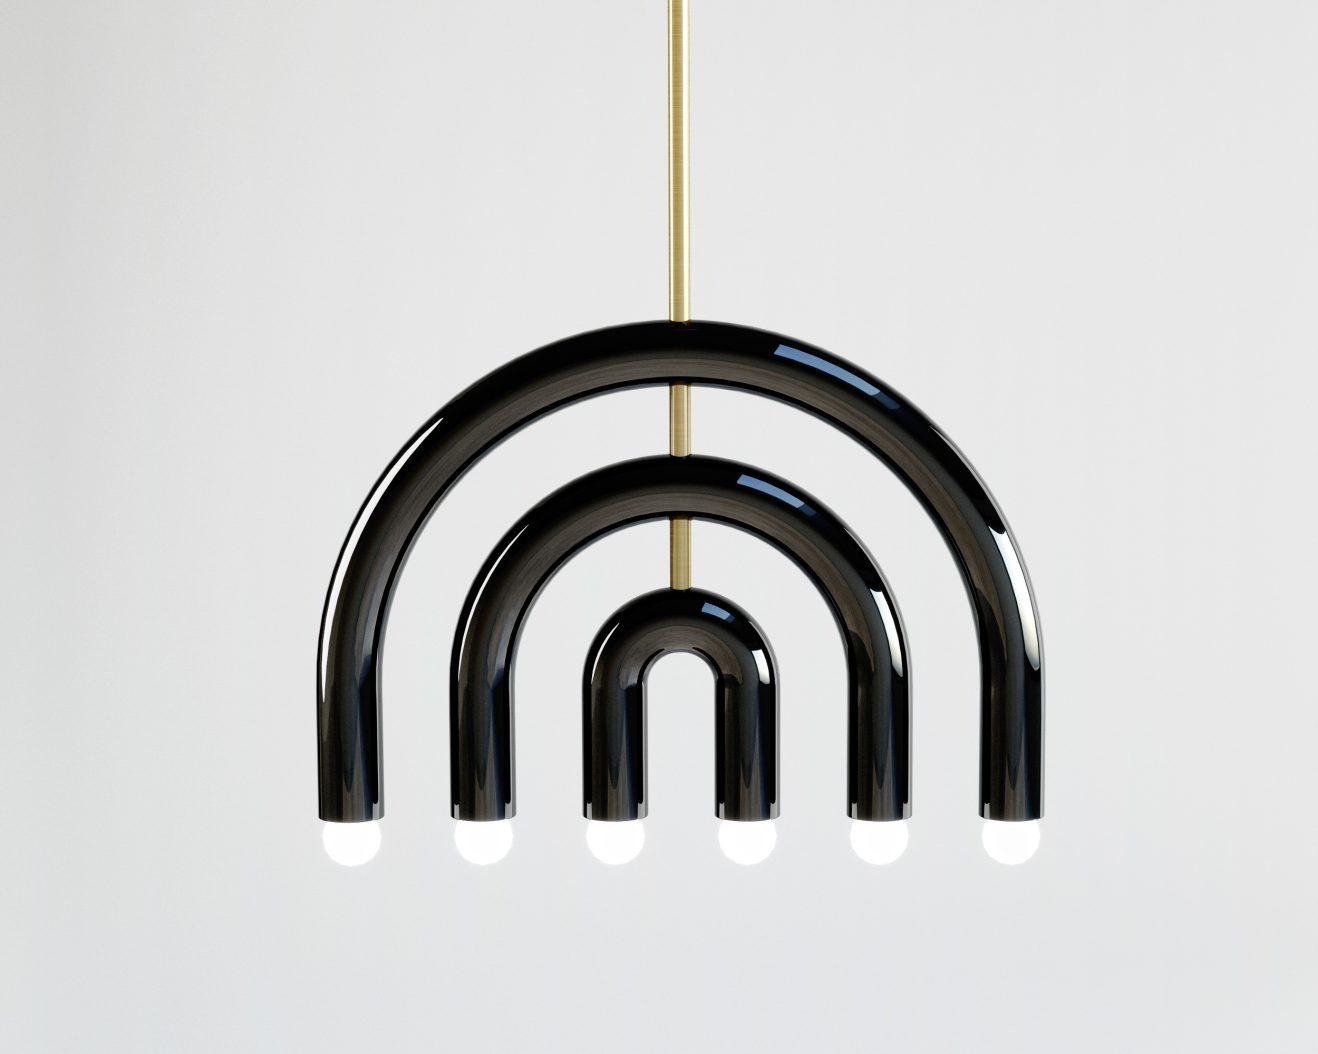 Pani-Jurek-Pendant-Lamp-F1-black